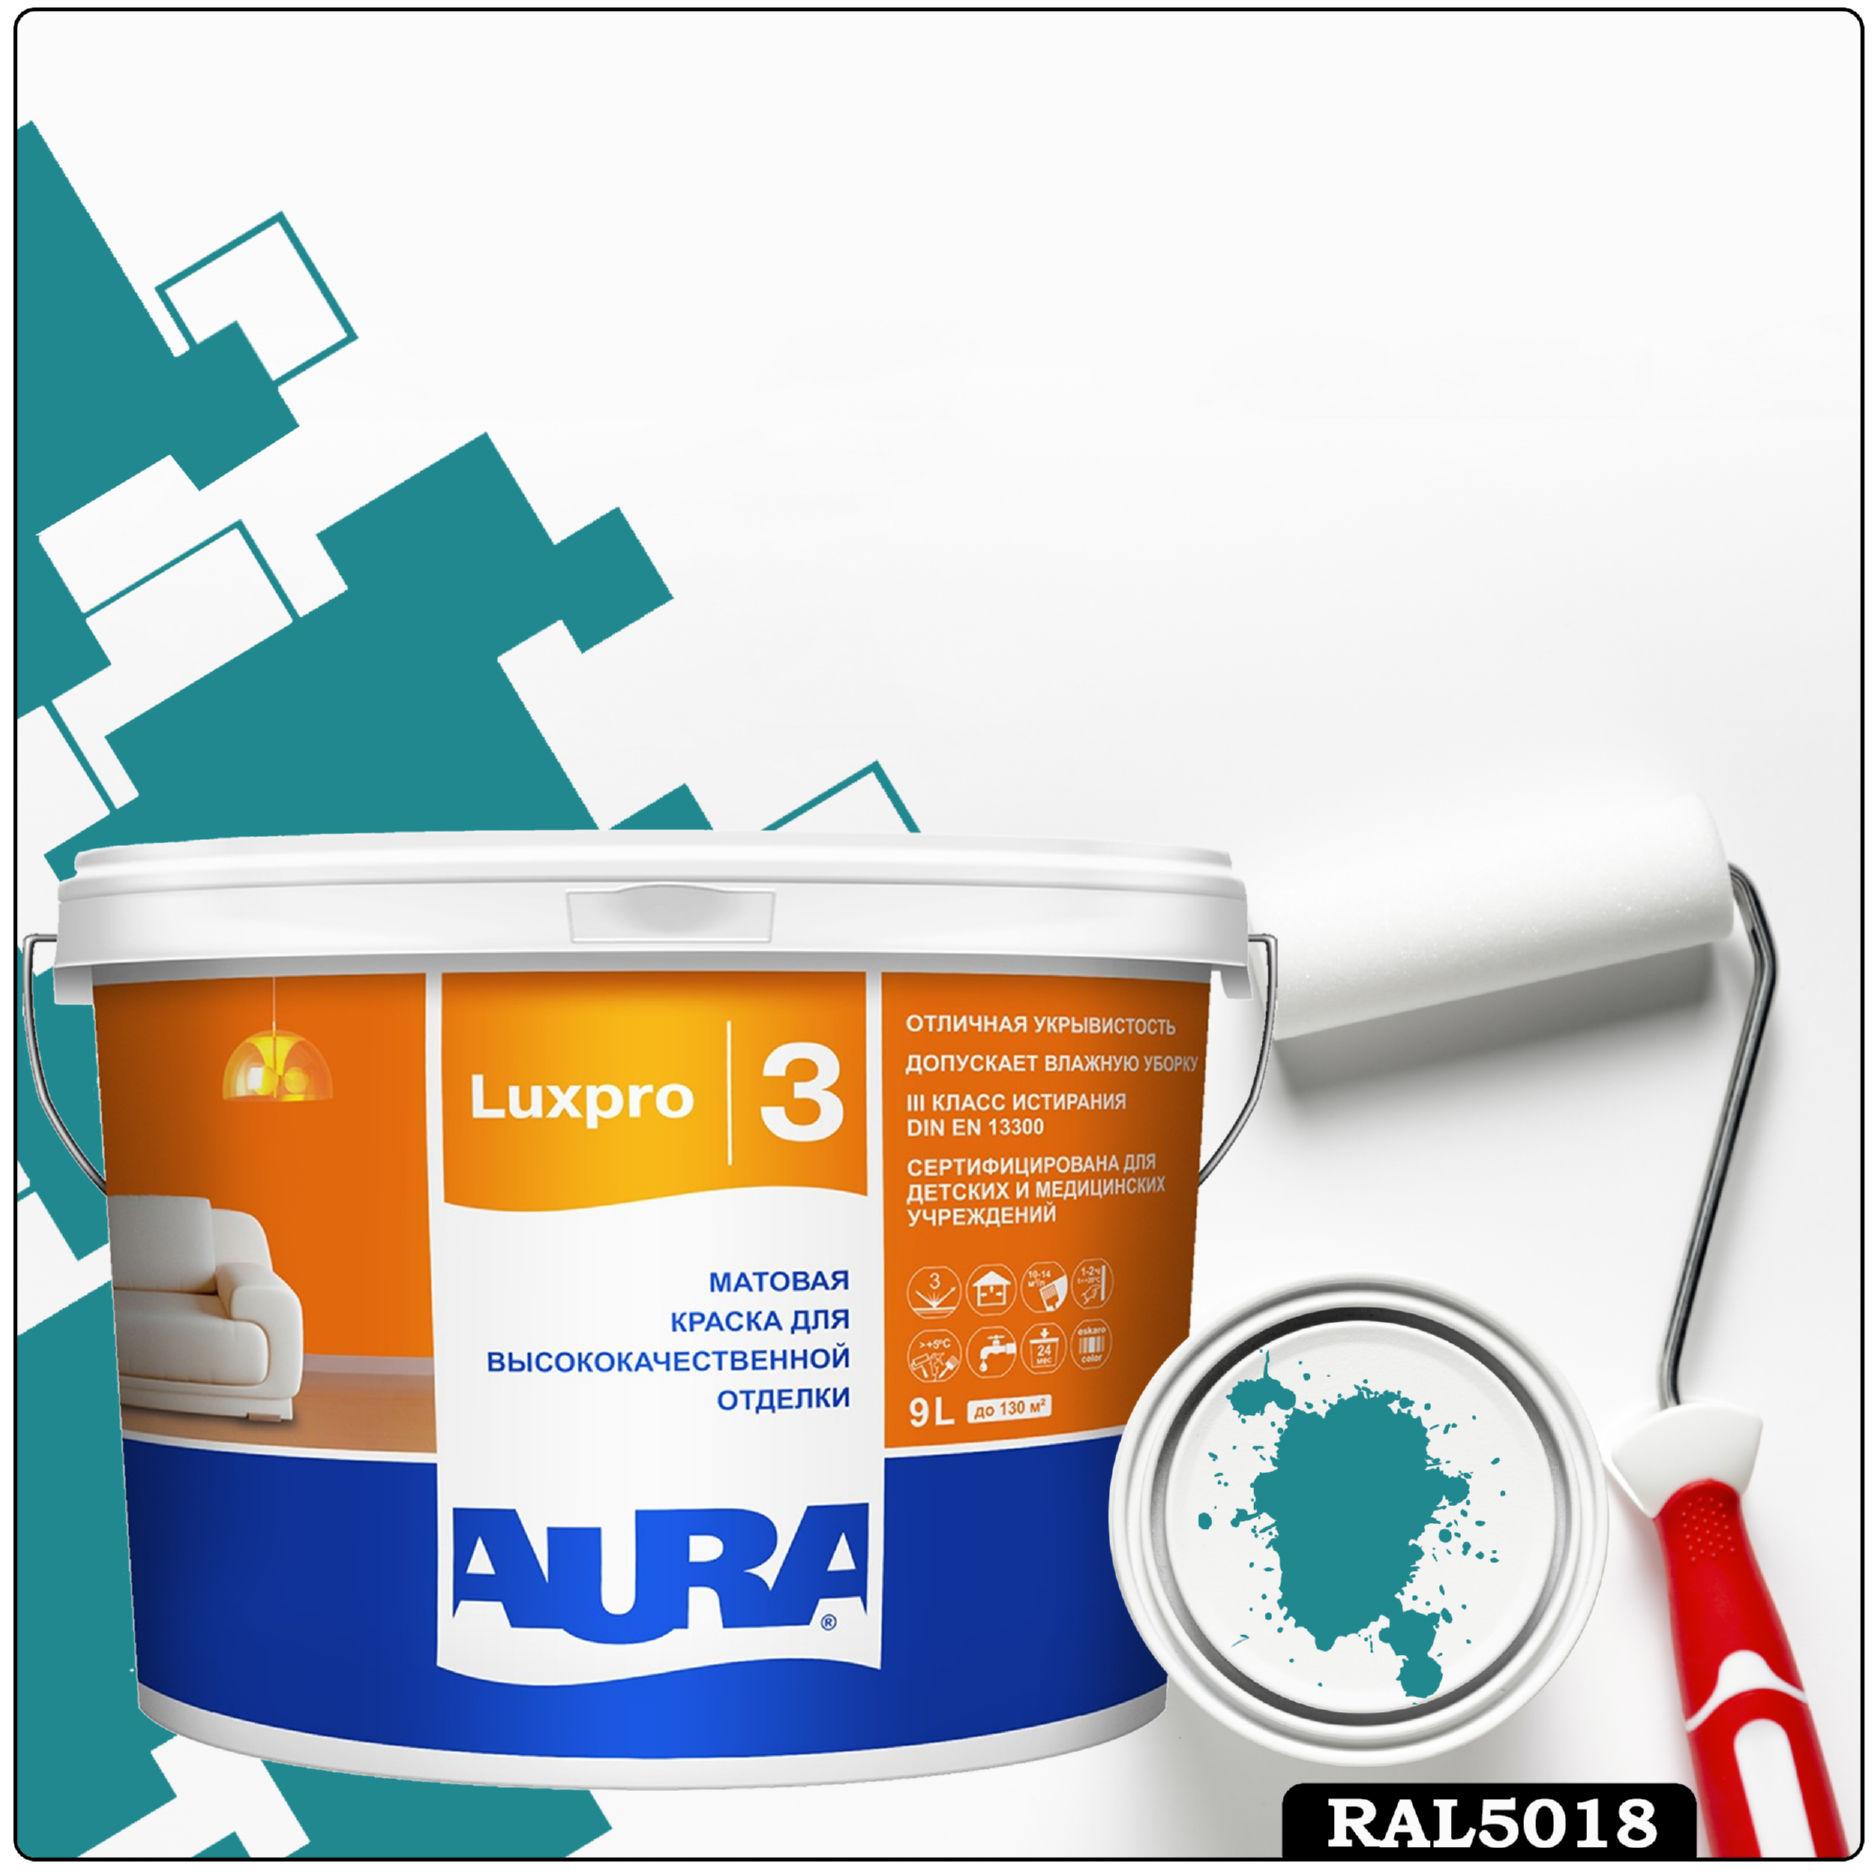 Фото 17 - Краска Aura LuxPRO 3, RAL 5018 Бирюзово-синий, латексная, шелково-матовая, интерьерная, 9л, Аура.